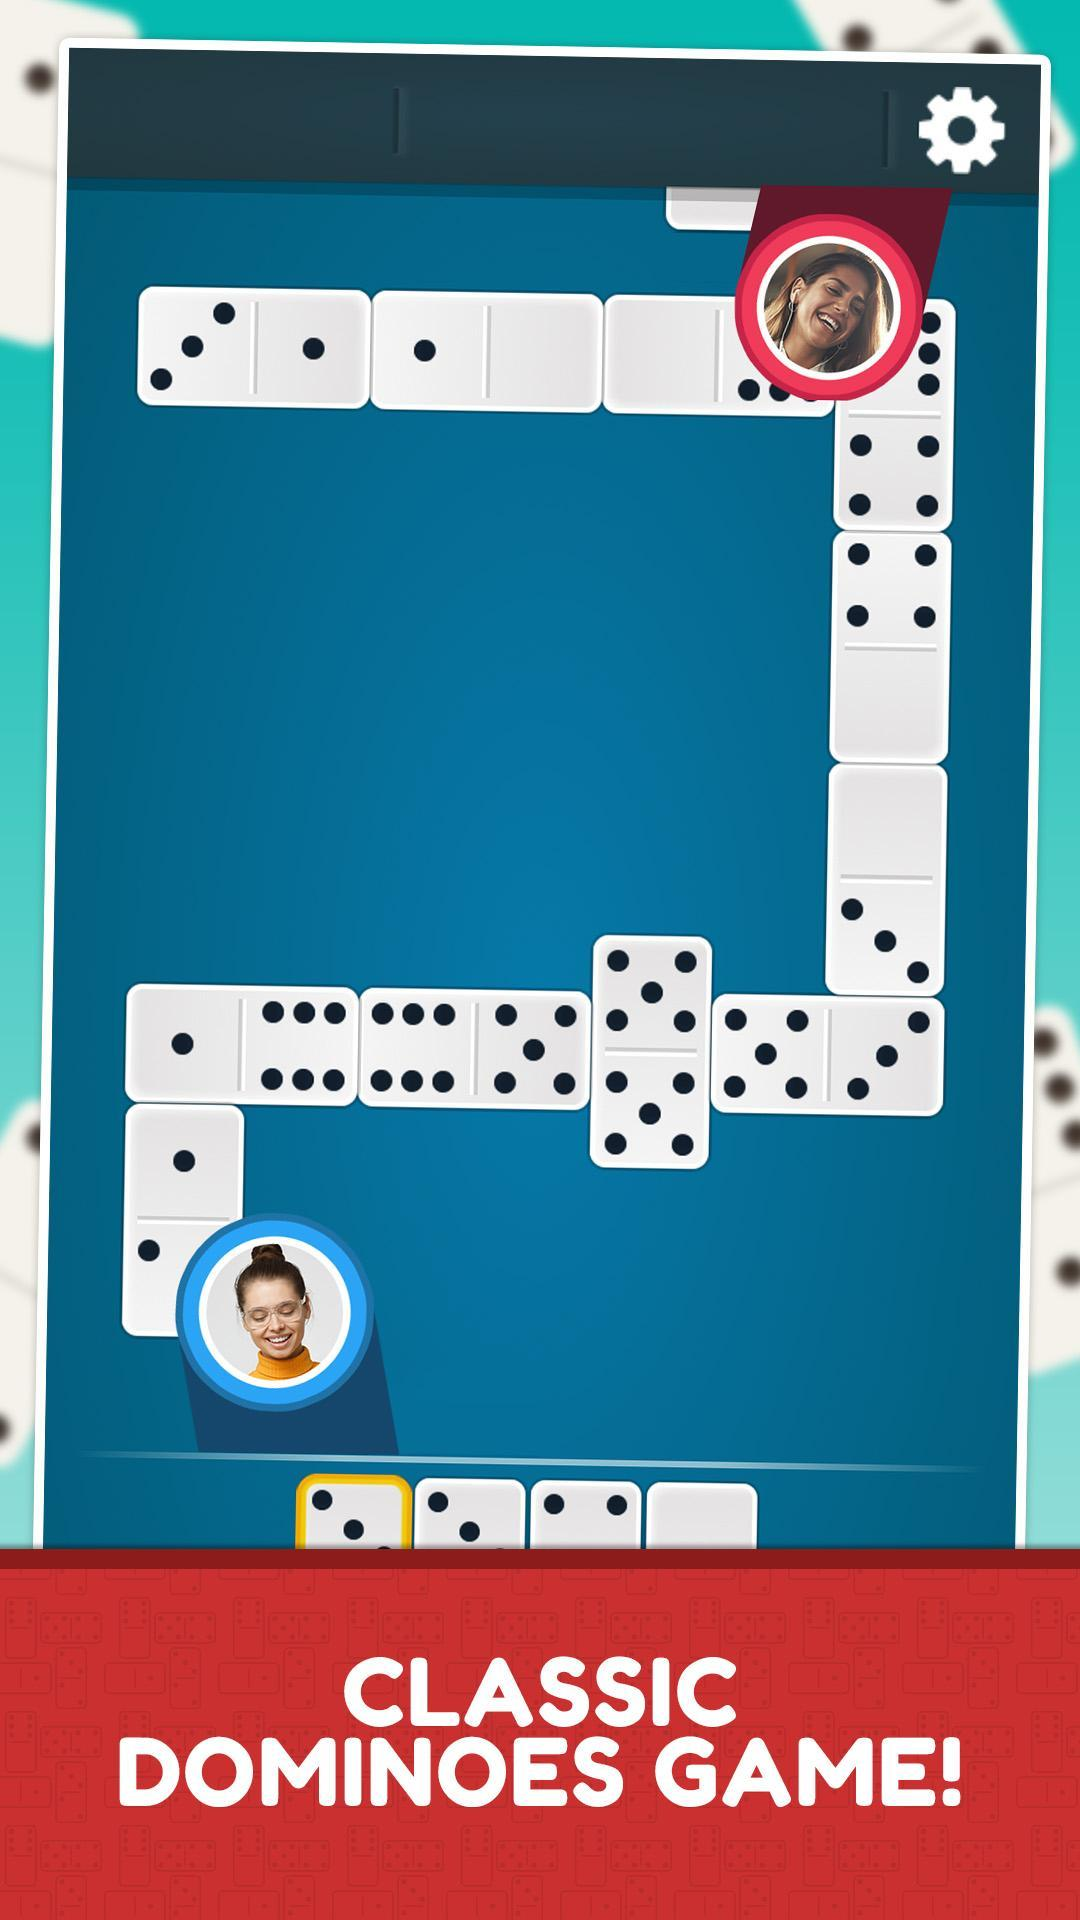 Dominoes Jogatina: Classic Board Game 5.1.1 Screenshot 1